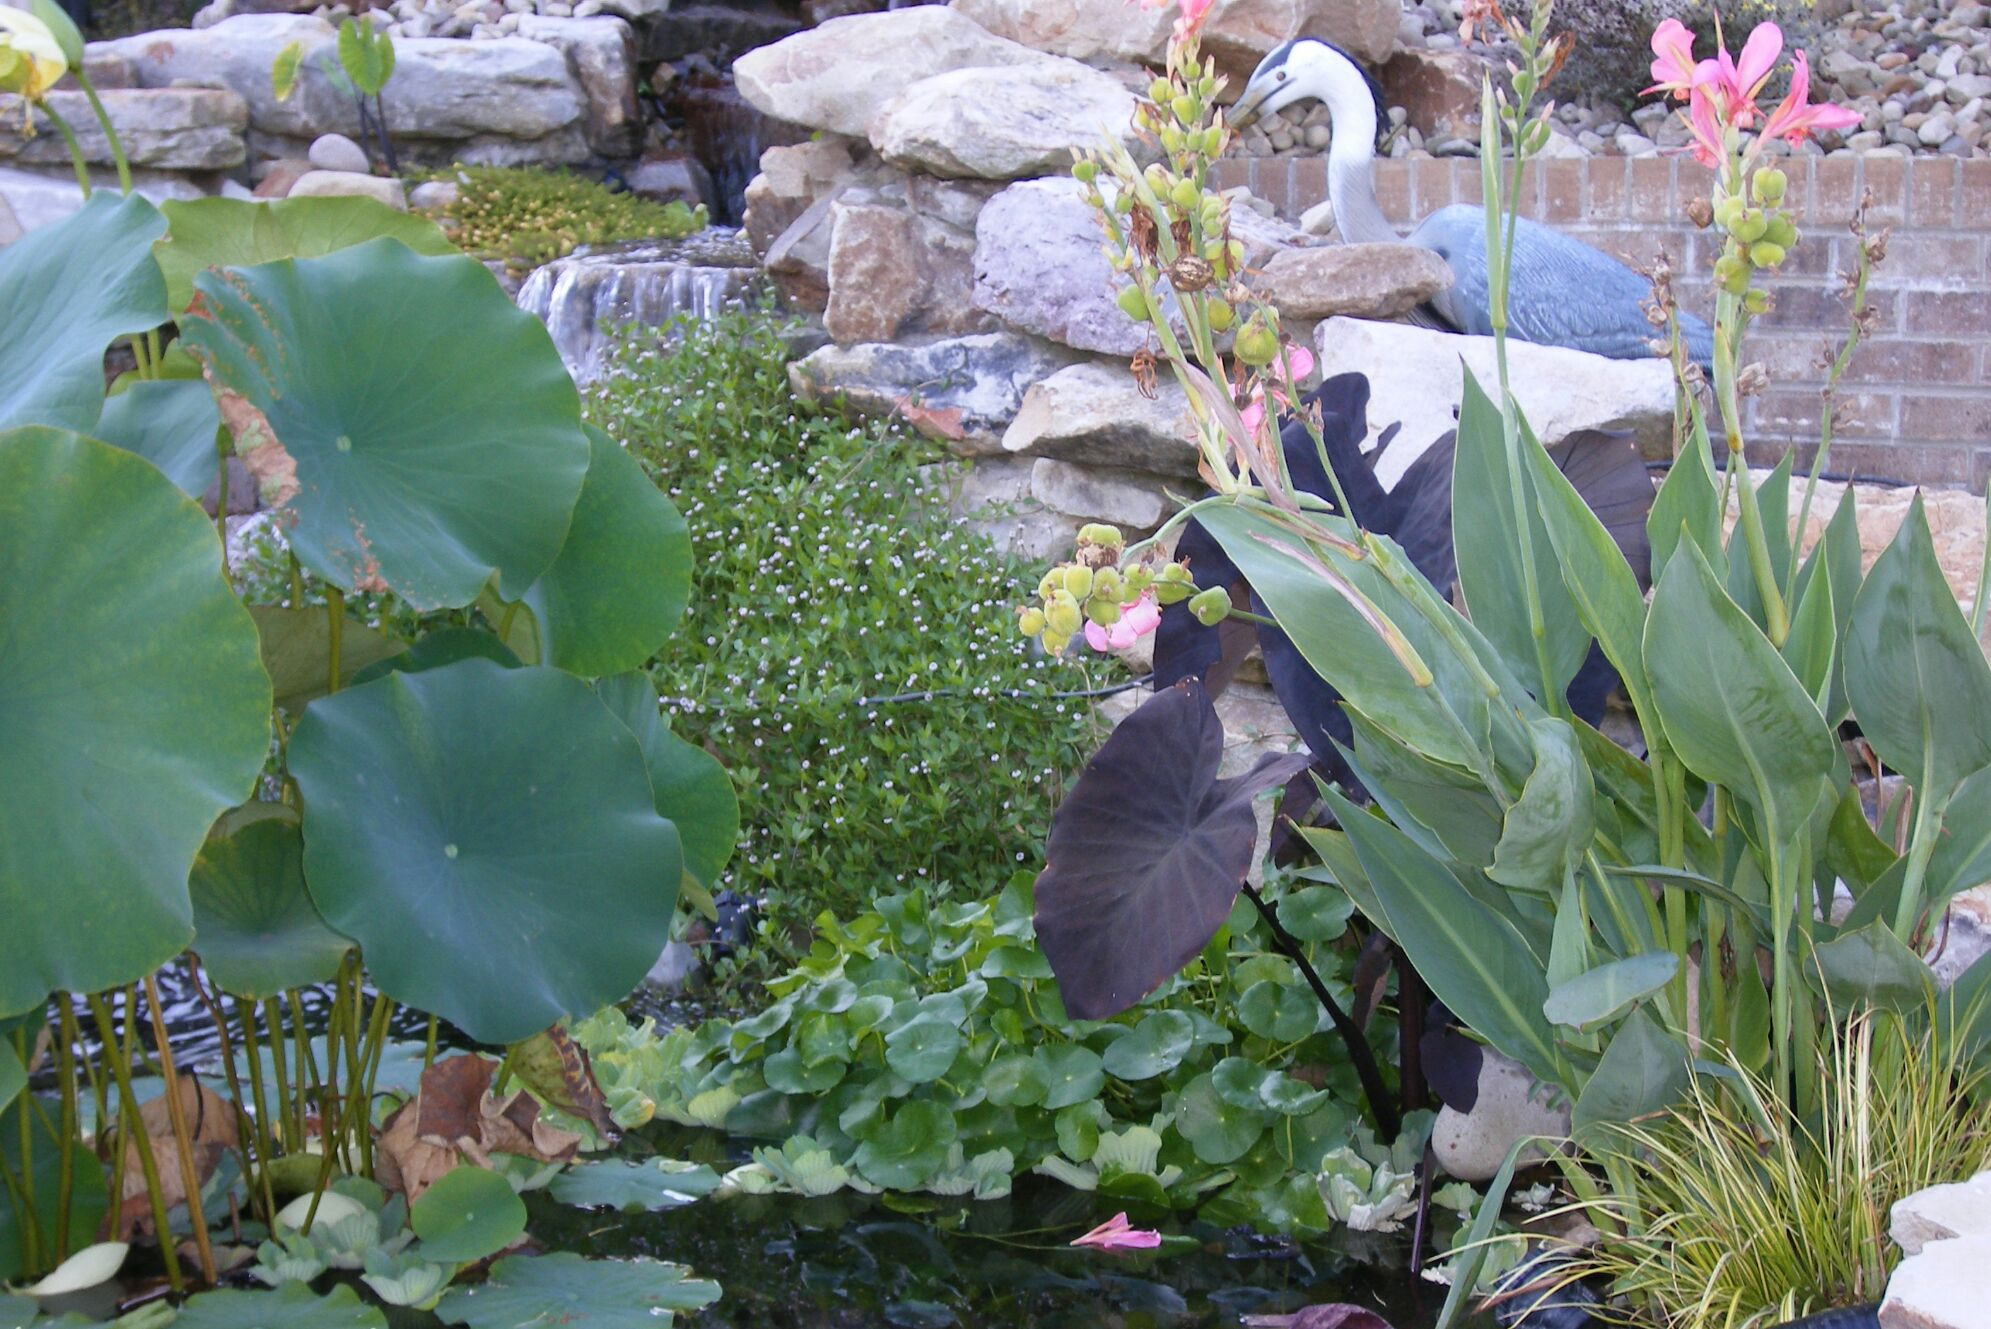 Pond Plants - cover